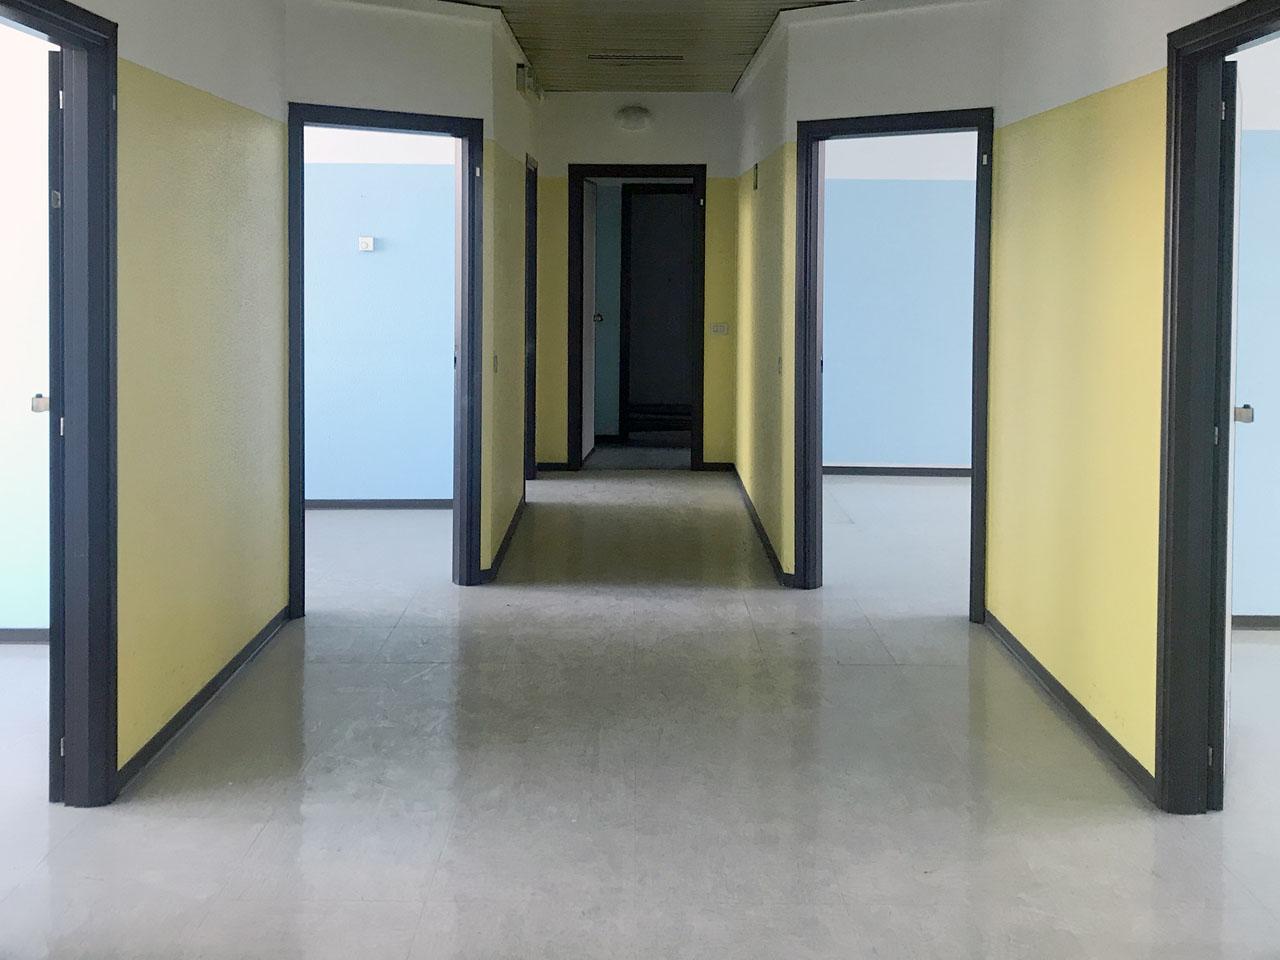 Office to rent in Milan - 425 mq (4575 sqft) - Atlantic Business Center